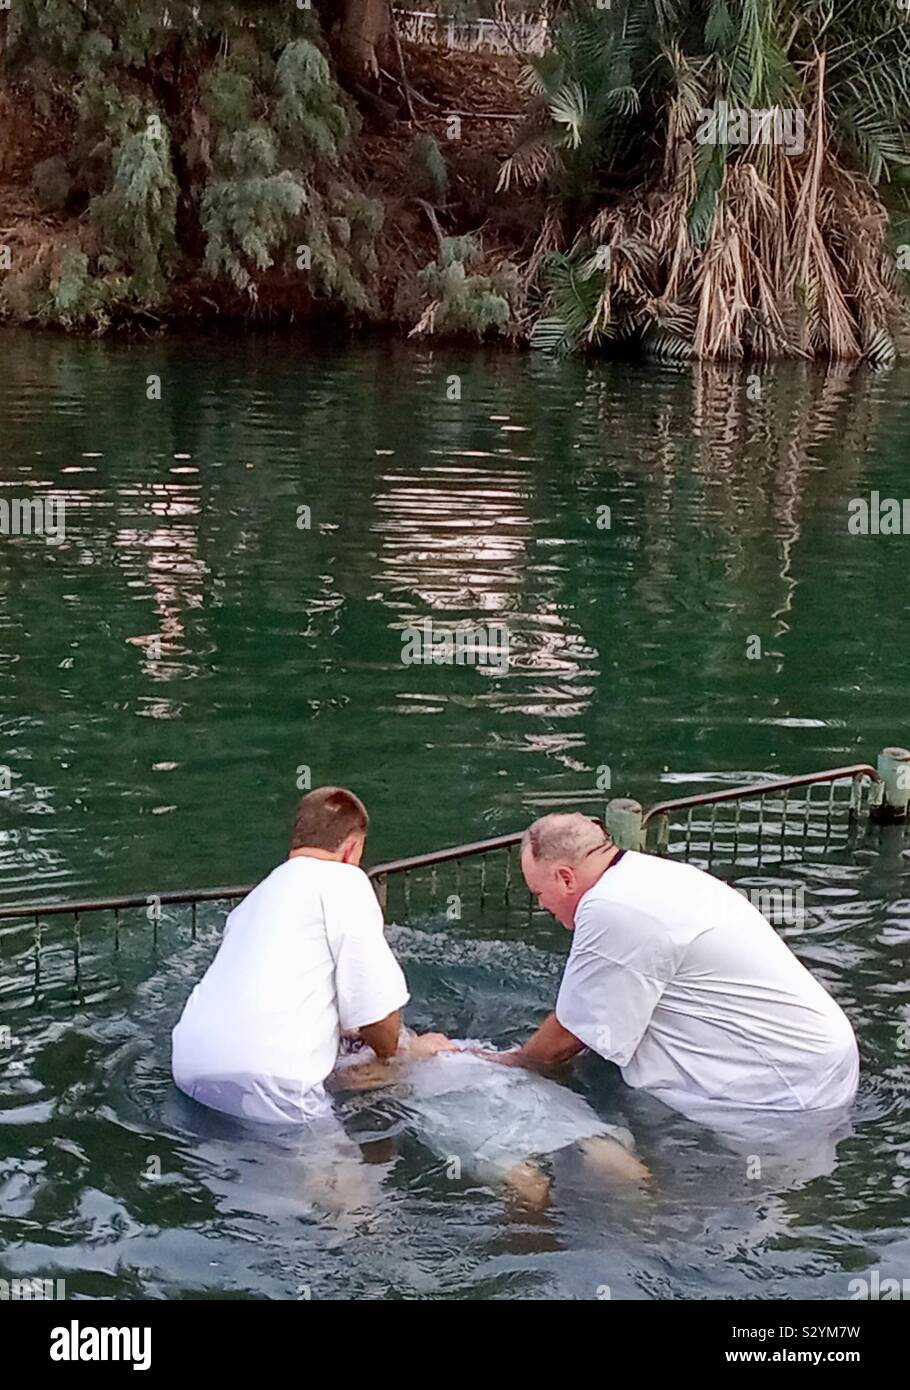 Baptism at the Jordan river in Israel. Stock Photo